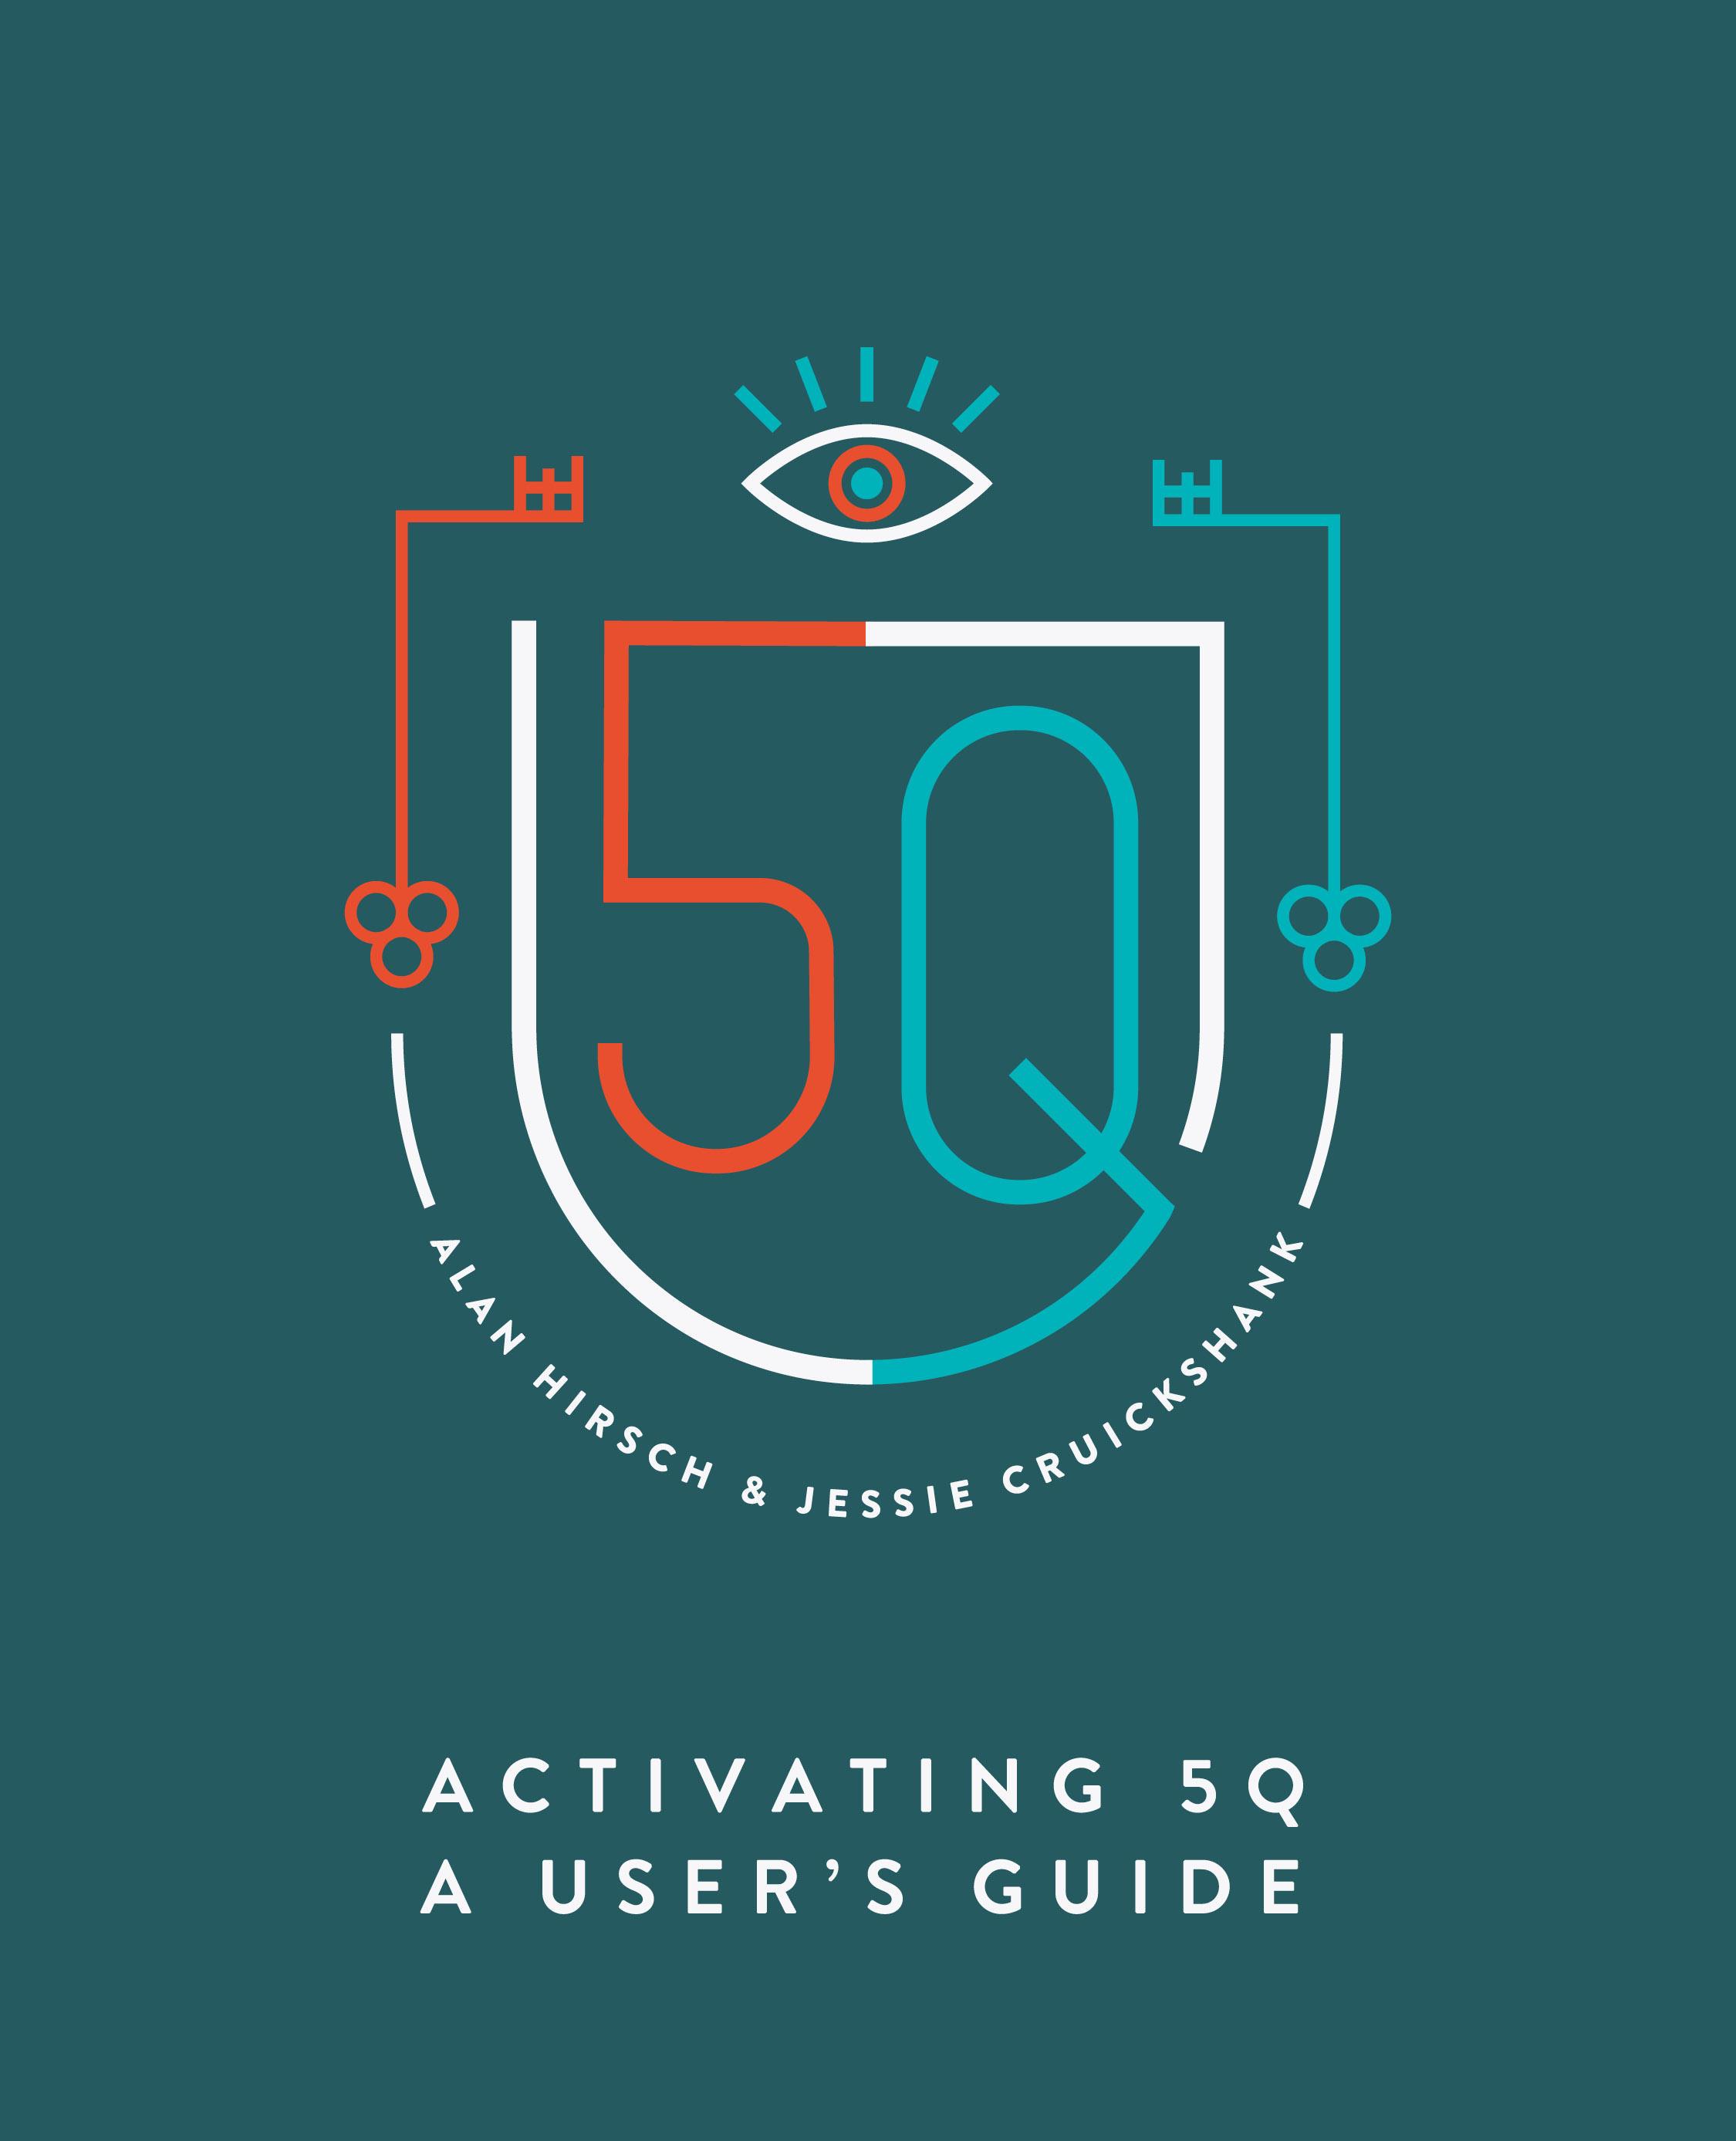 Just released! New book by Alan Hirsch and Jessie Cruickshank